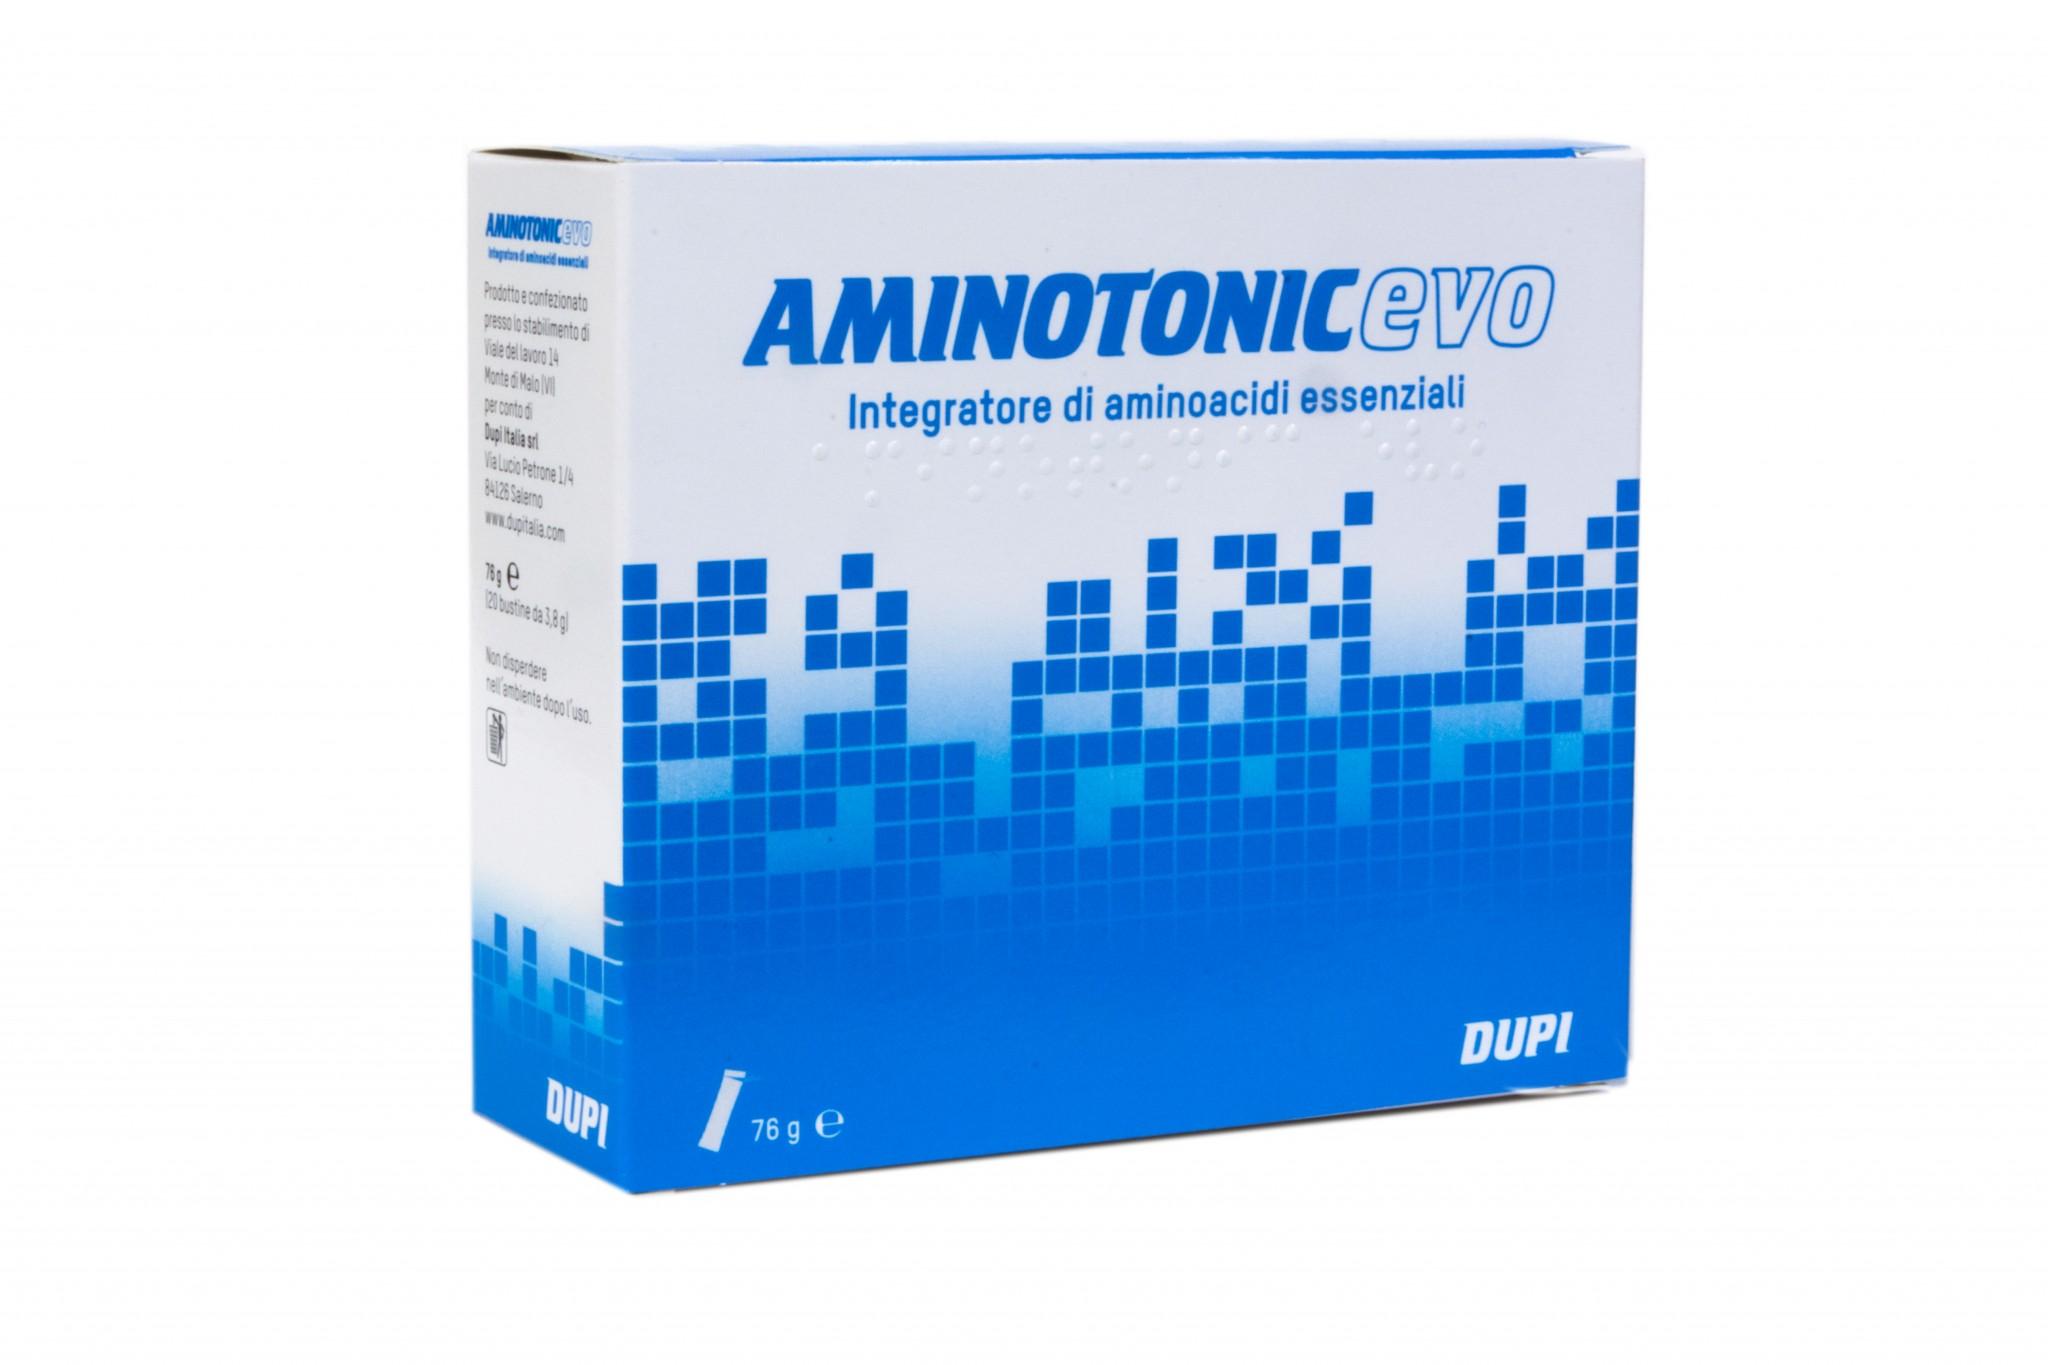 Aminotonic Evo